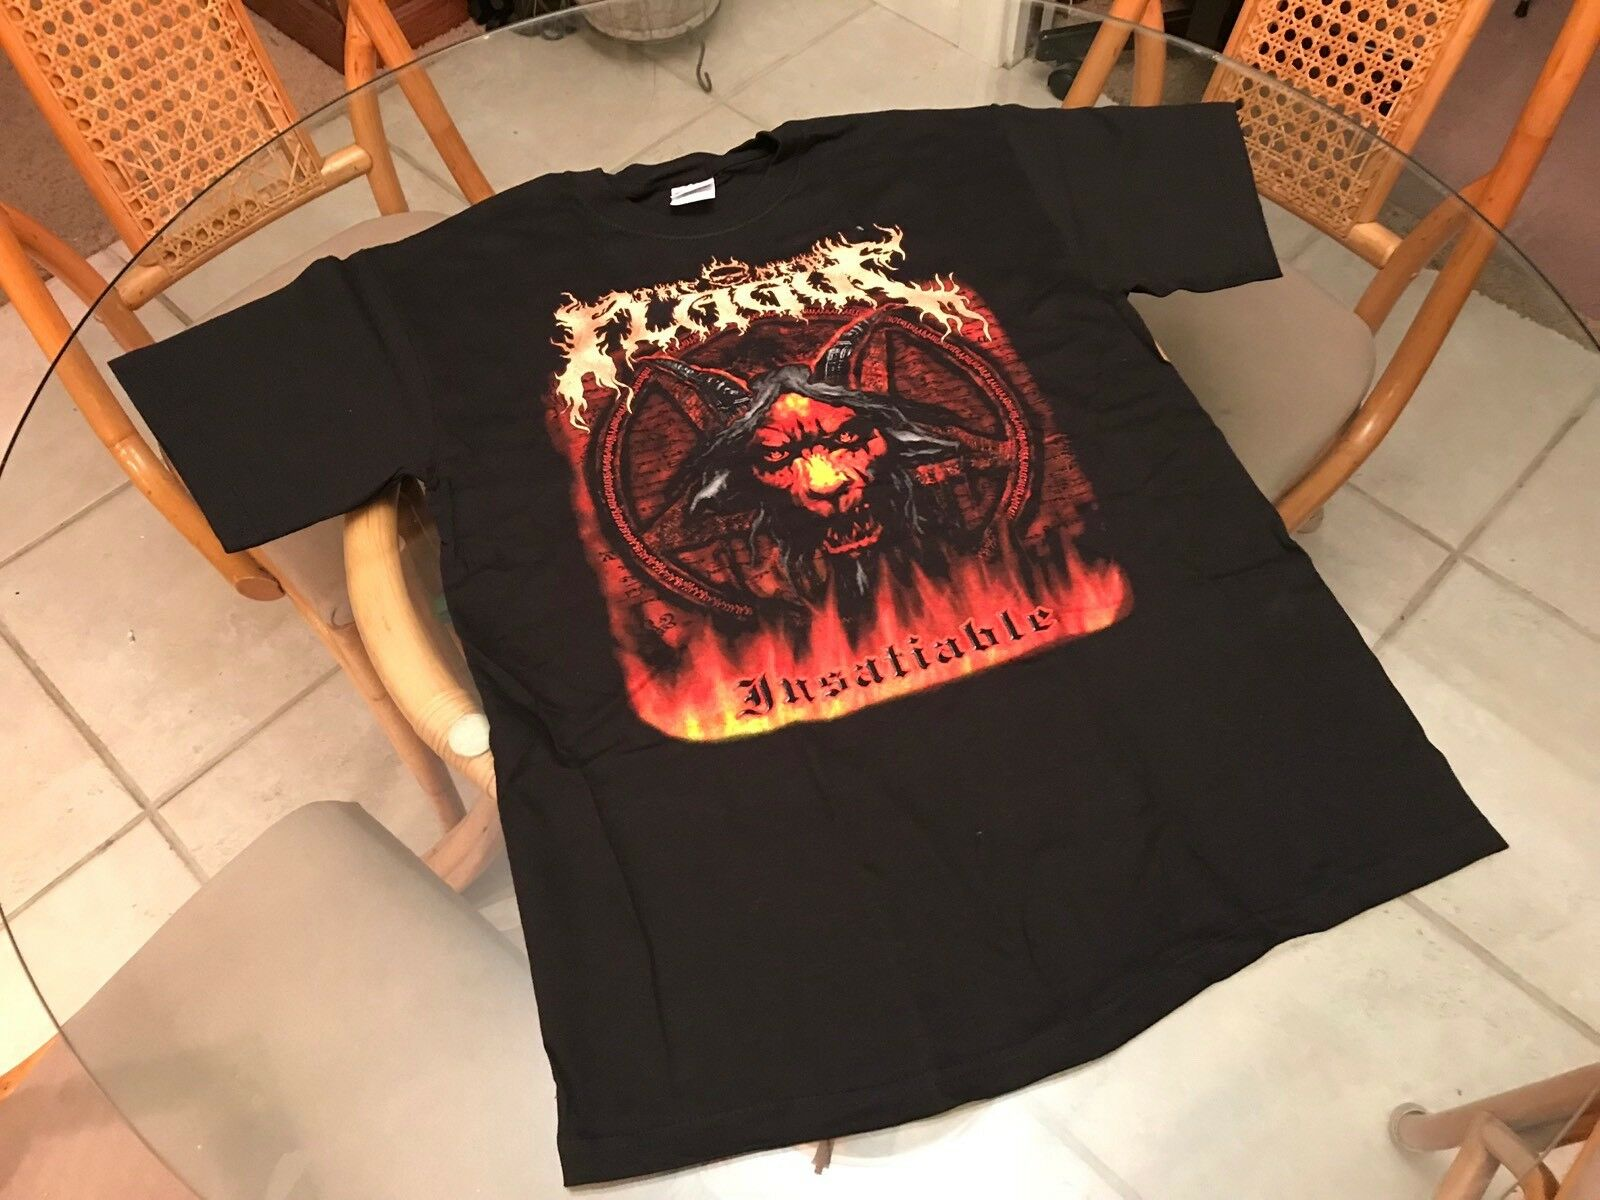 The New Plague Insatiable 2008 Medium T-Shirt  (See) Morbid Angle & Obituary